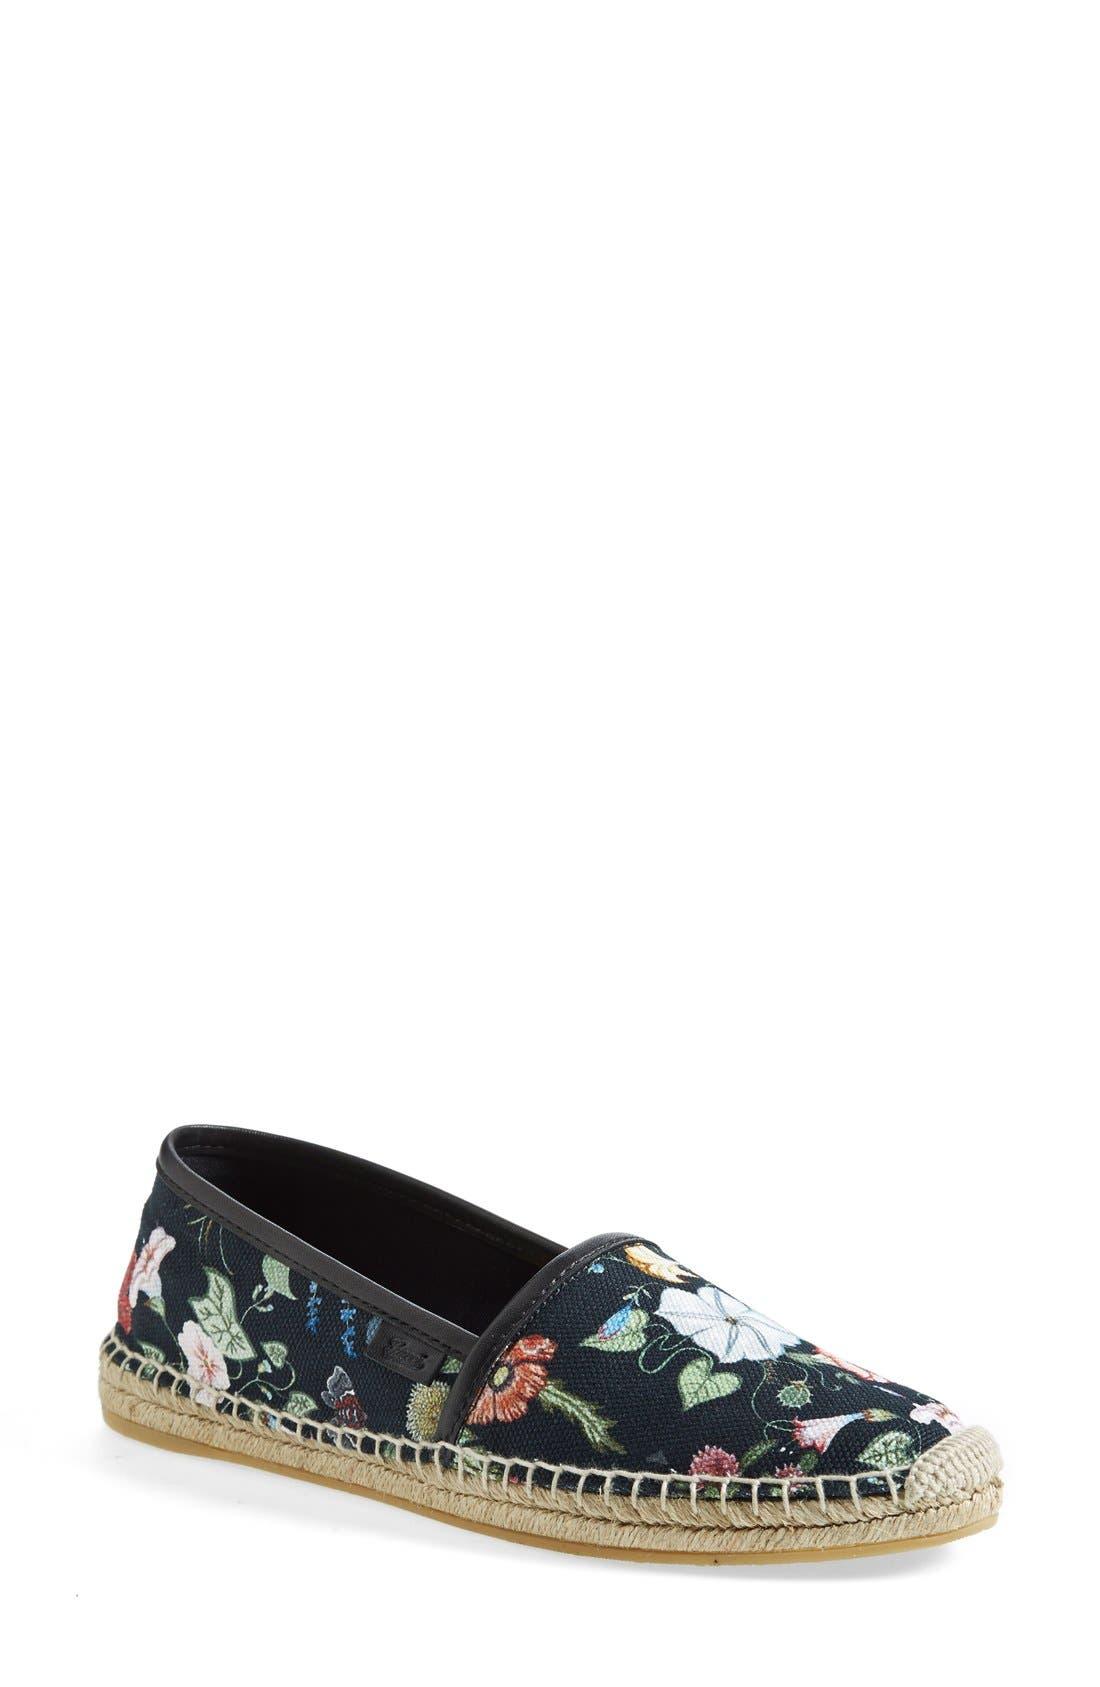 Alternate Image 1 Selected - Gucci 'Pilar' Floral Print Espadrille Flat